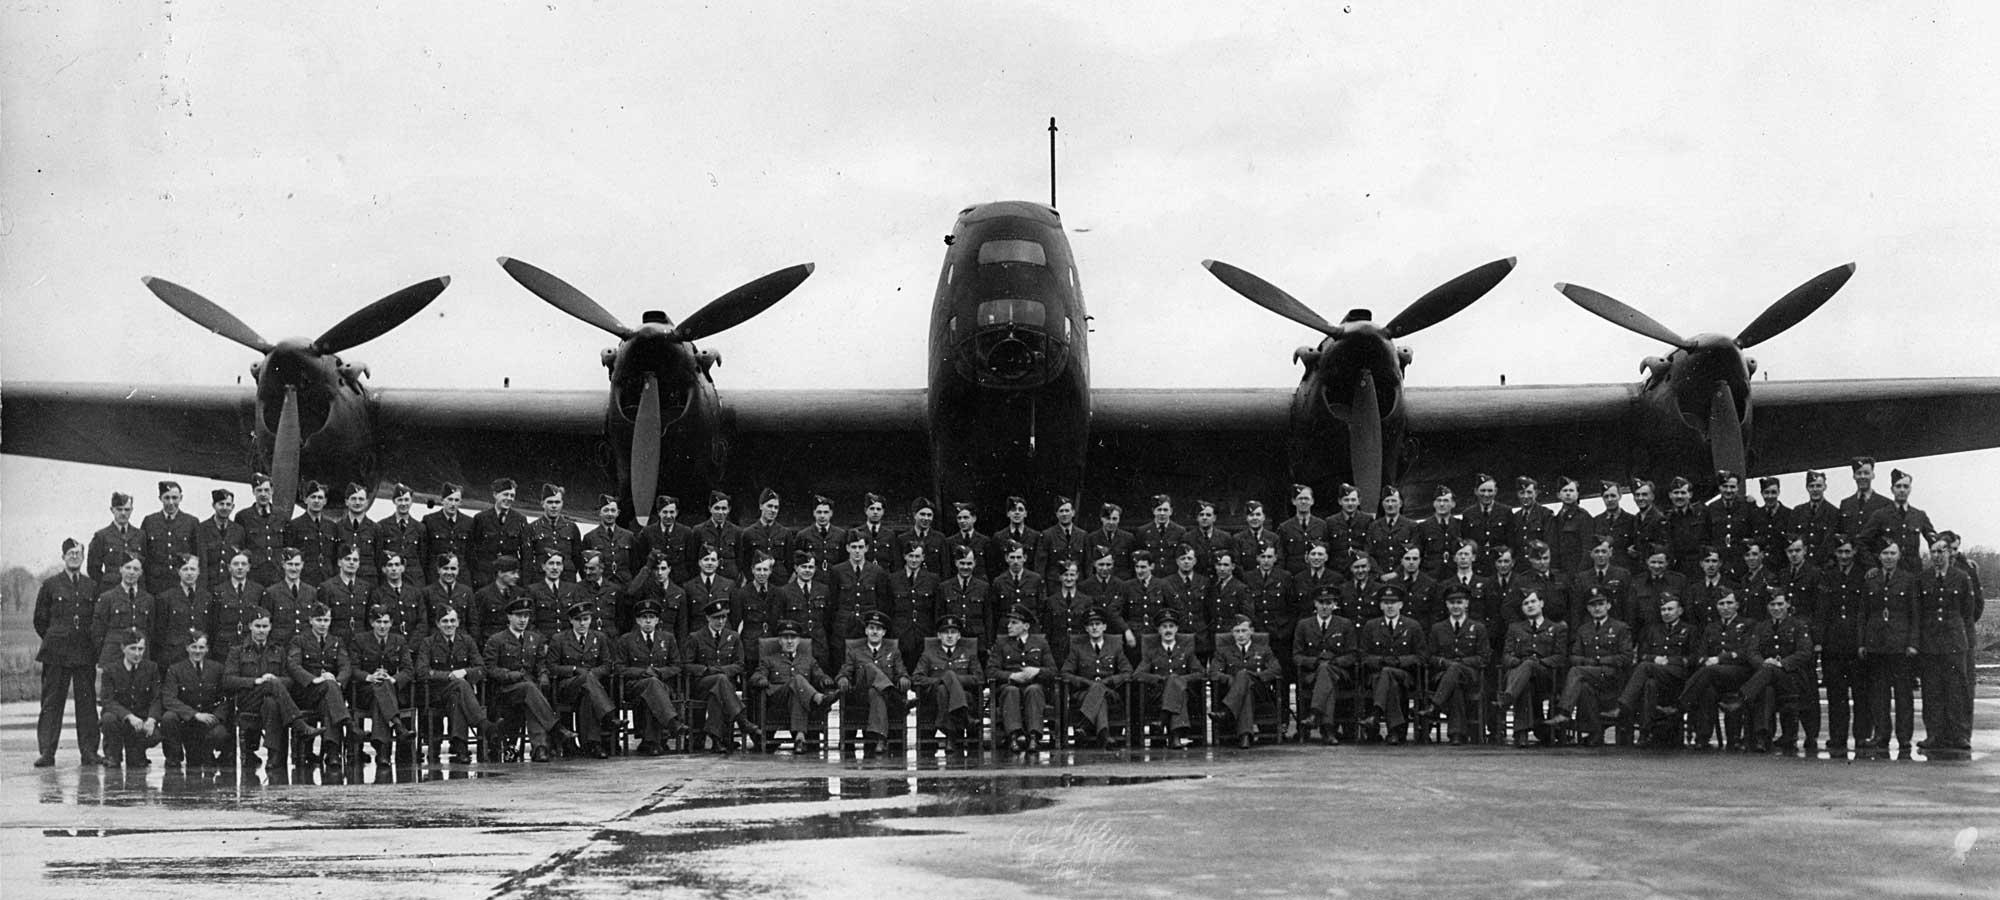 Halifax bomber - Merlin engines